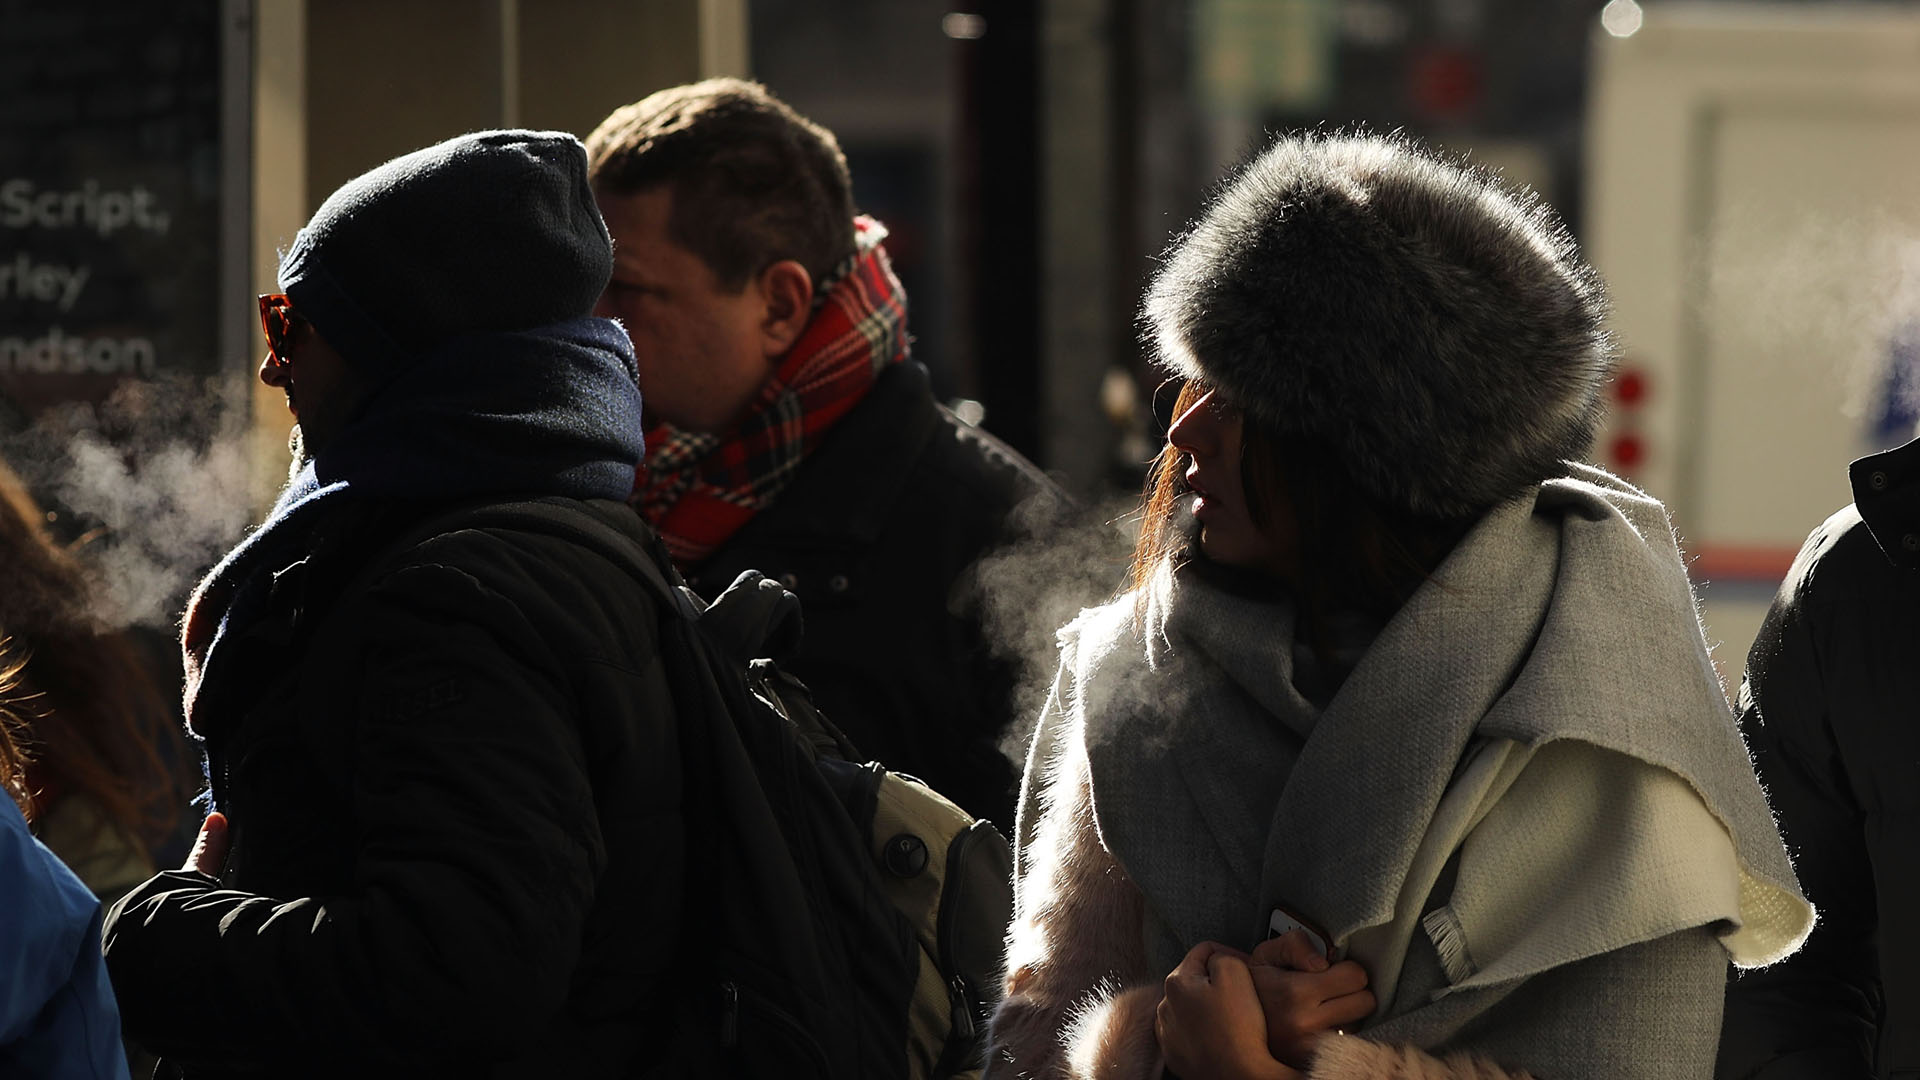 Cold weather, winter chill, frigid Manhattan, New York32209714-159532